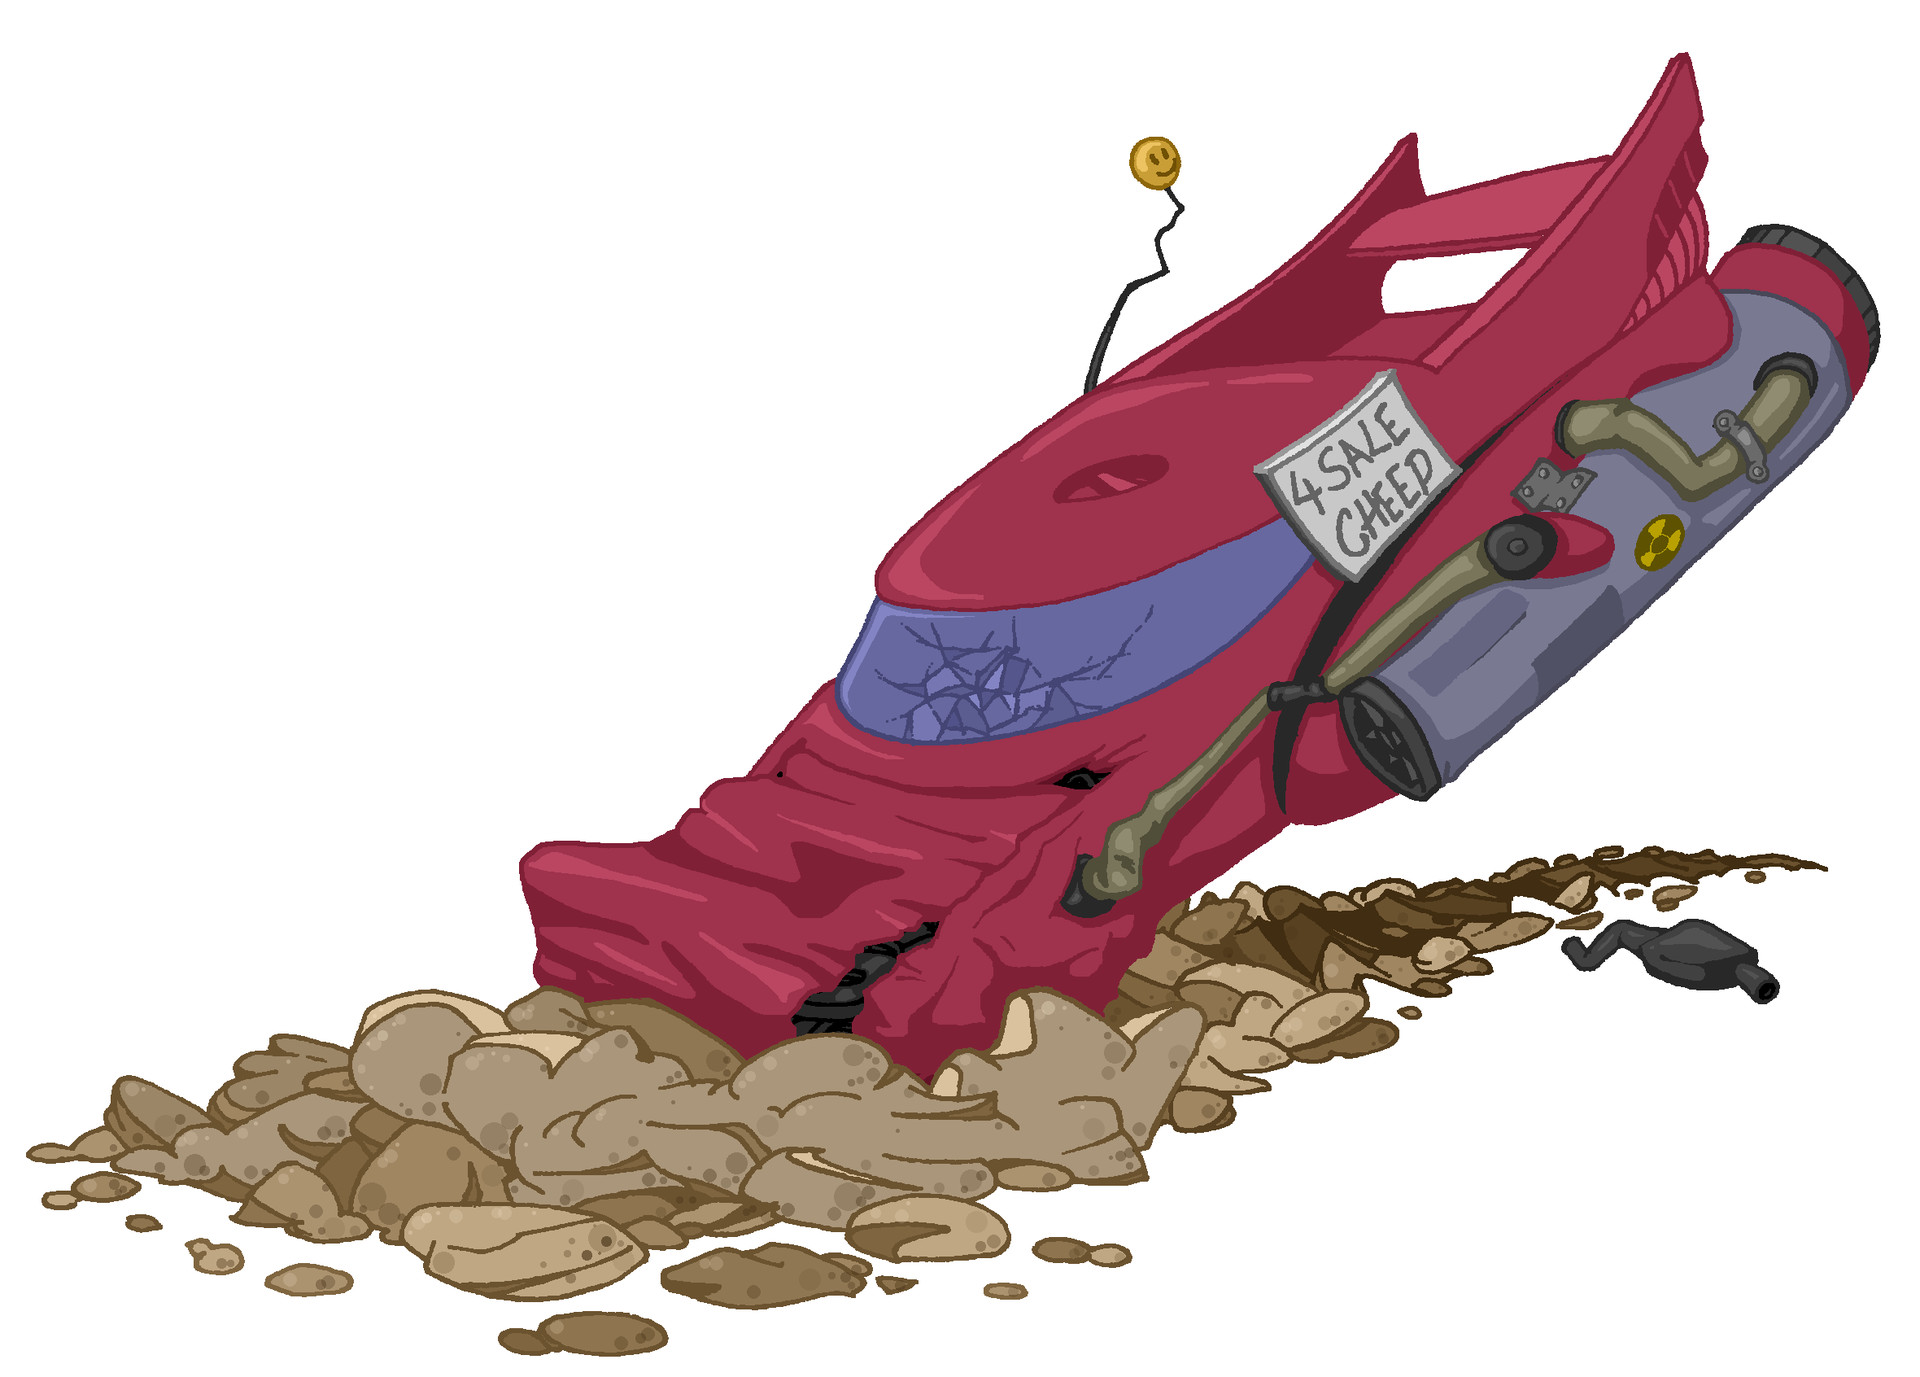 Artstation snails game assets. Spaceship clipart spaceship crash